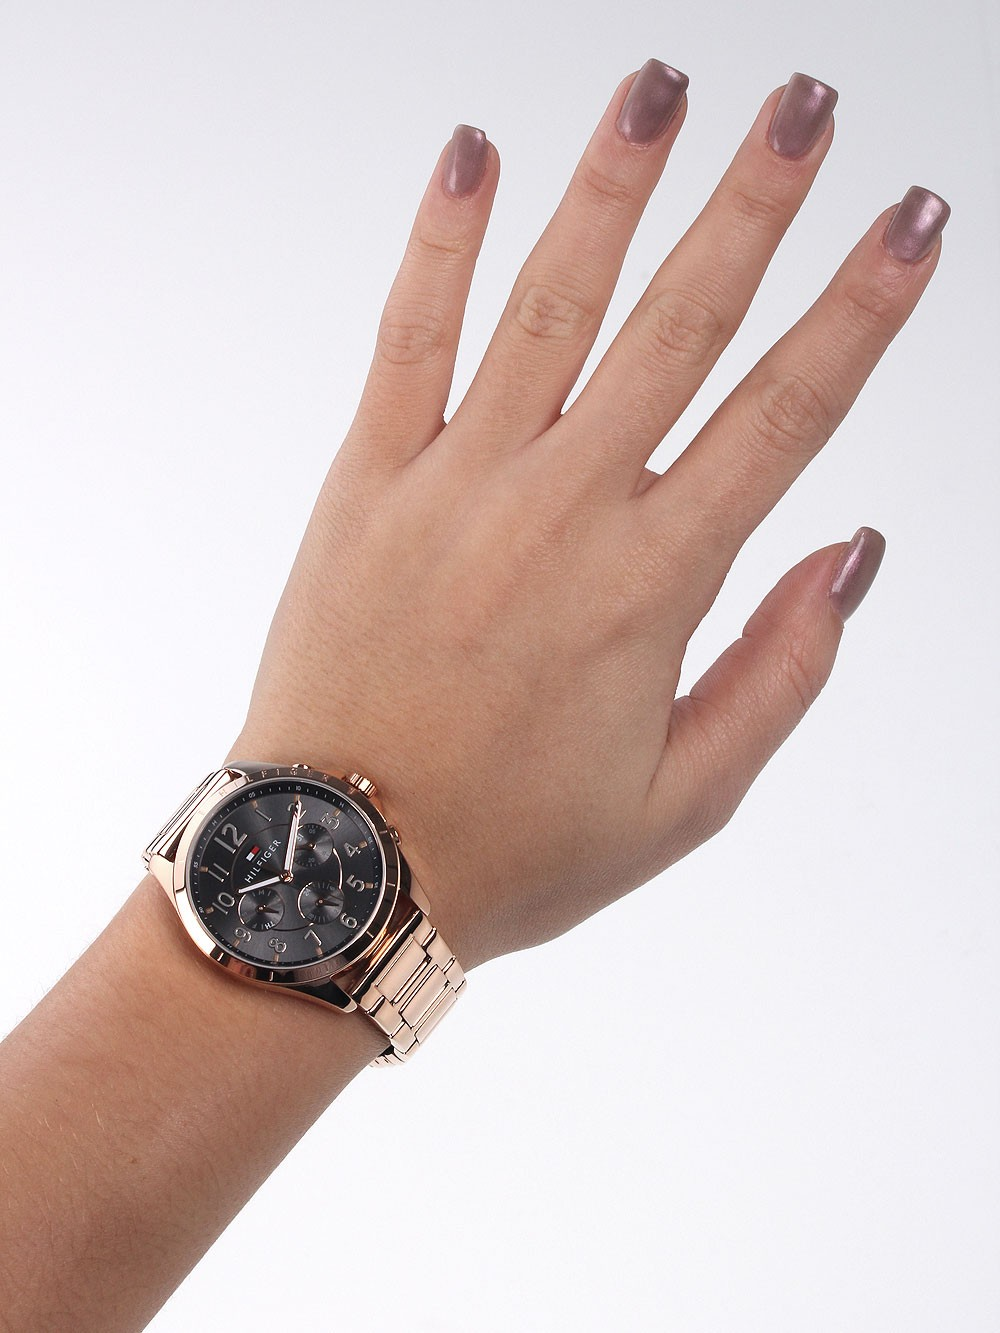 watches chrono12 tommy hilfiger 1781606 damenuhr 36mm 3atm. Black Bedroom Furniture Sets. Home Design Ideas